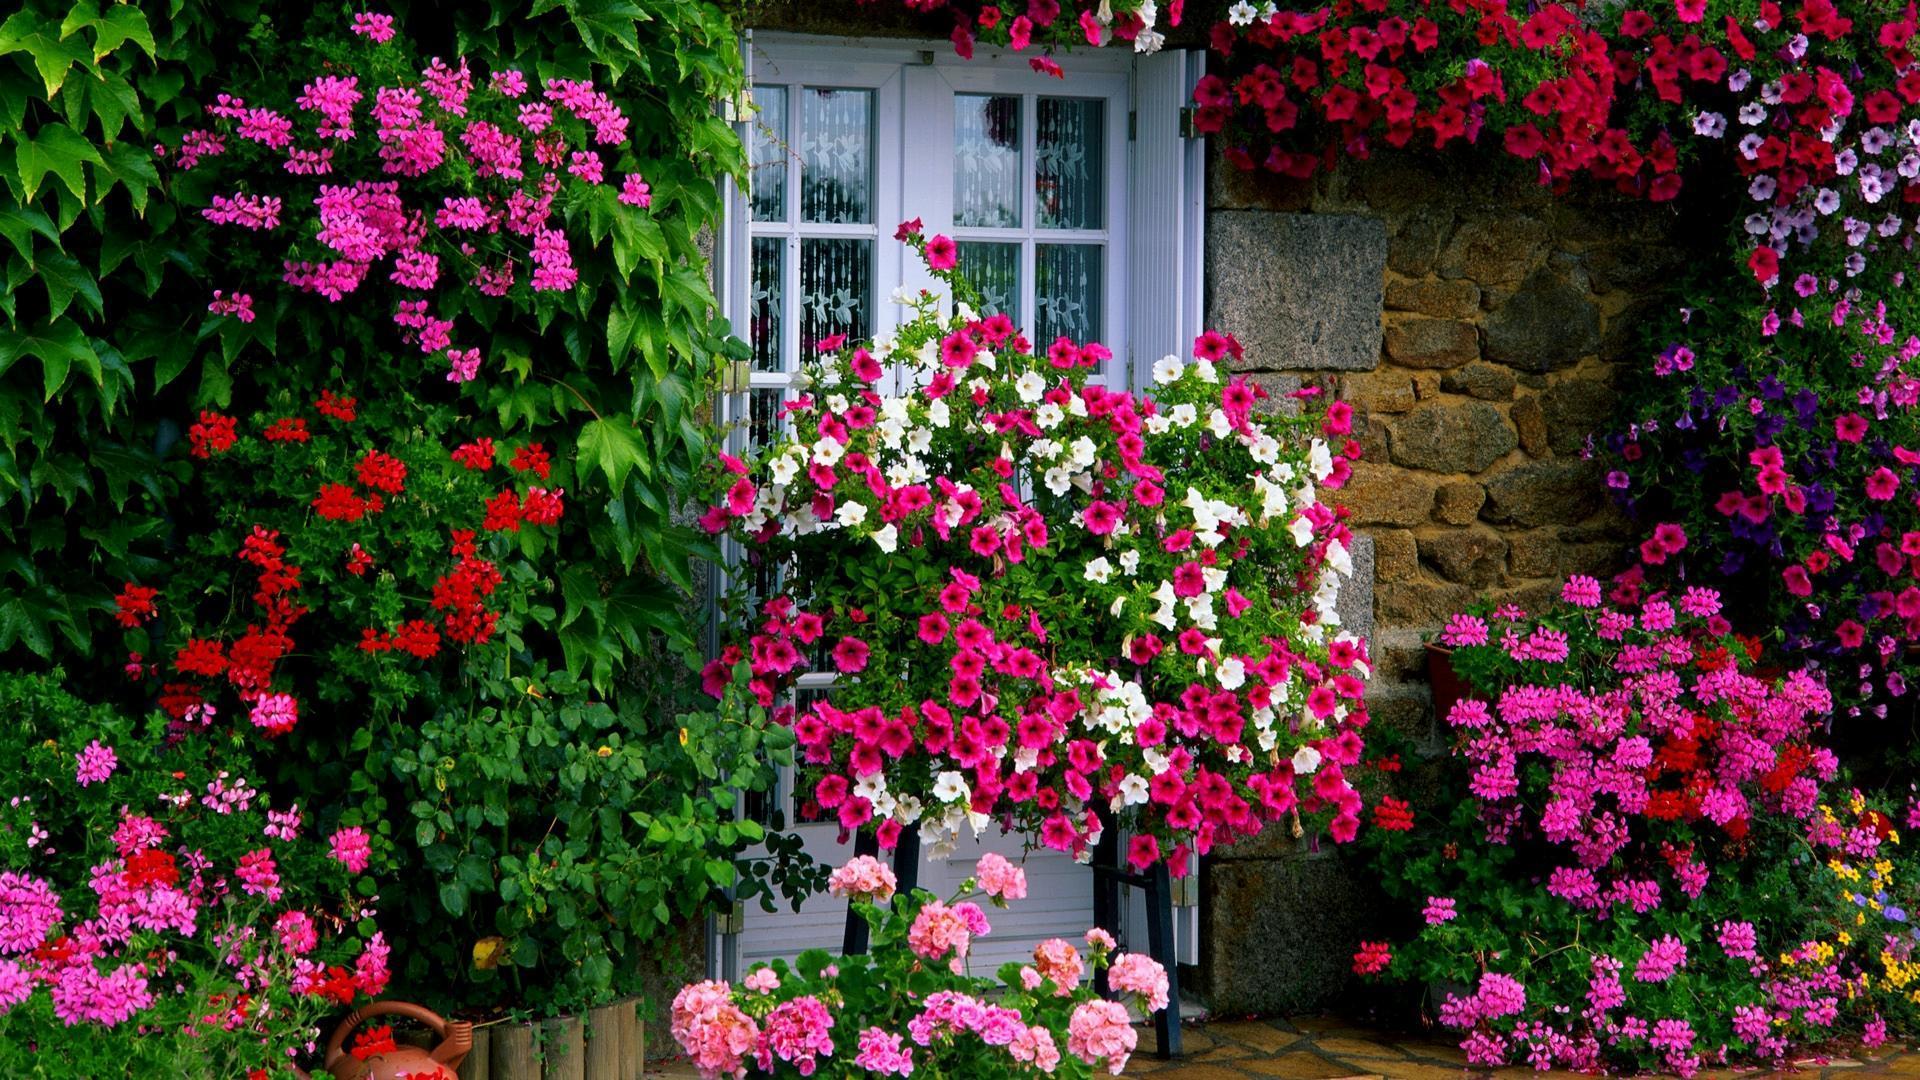 Spring garden wallpaper wallpapersafari for French balcony definition